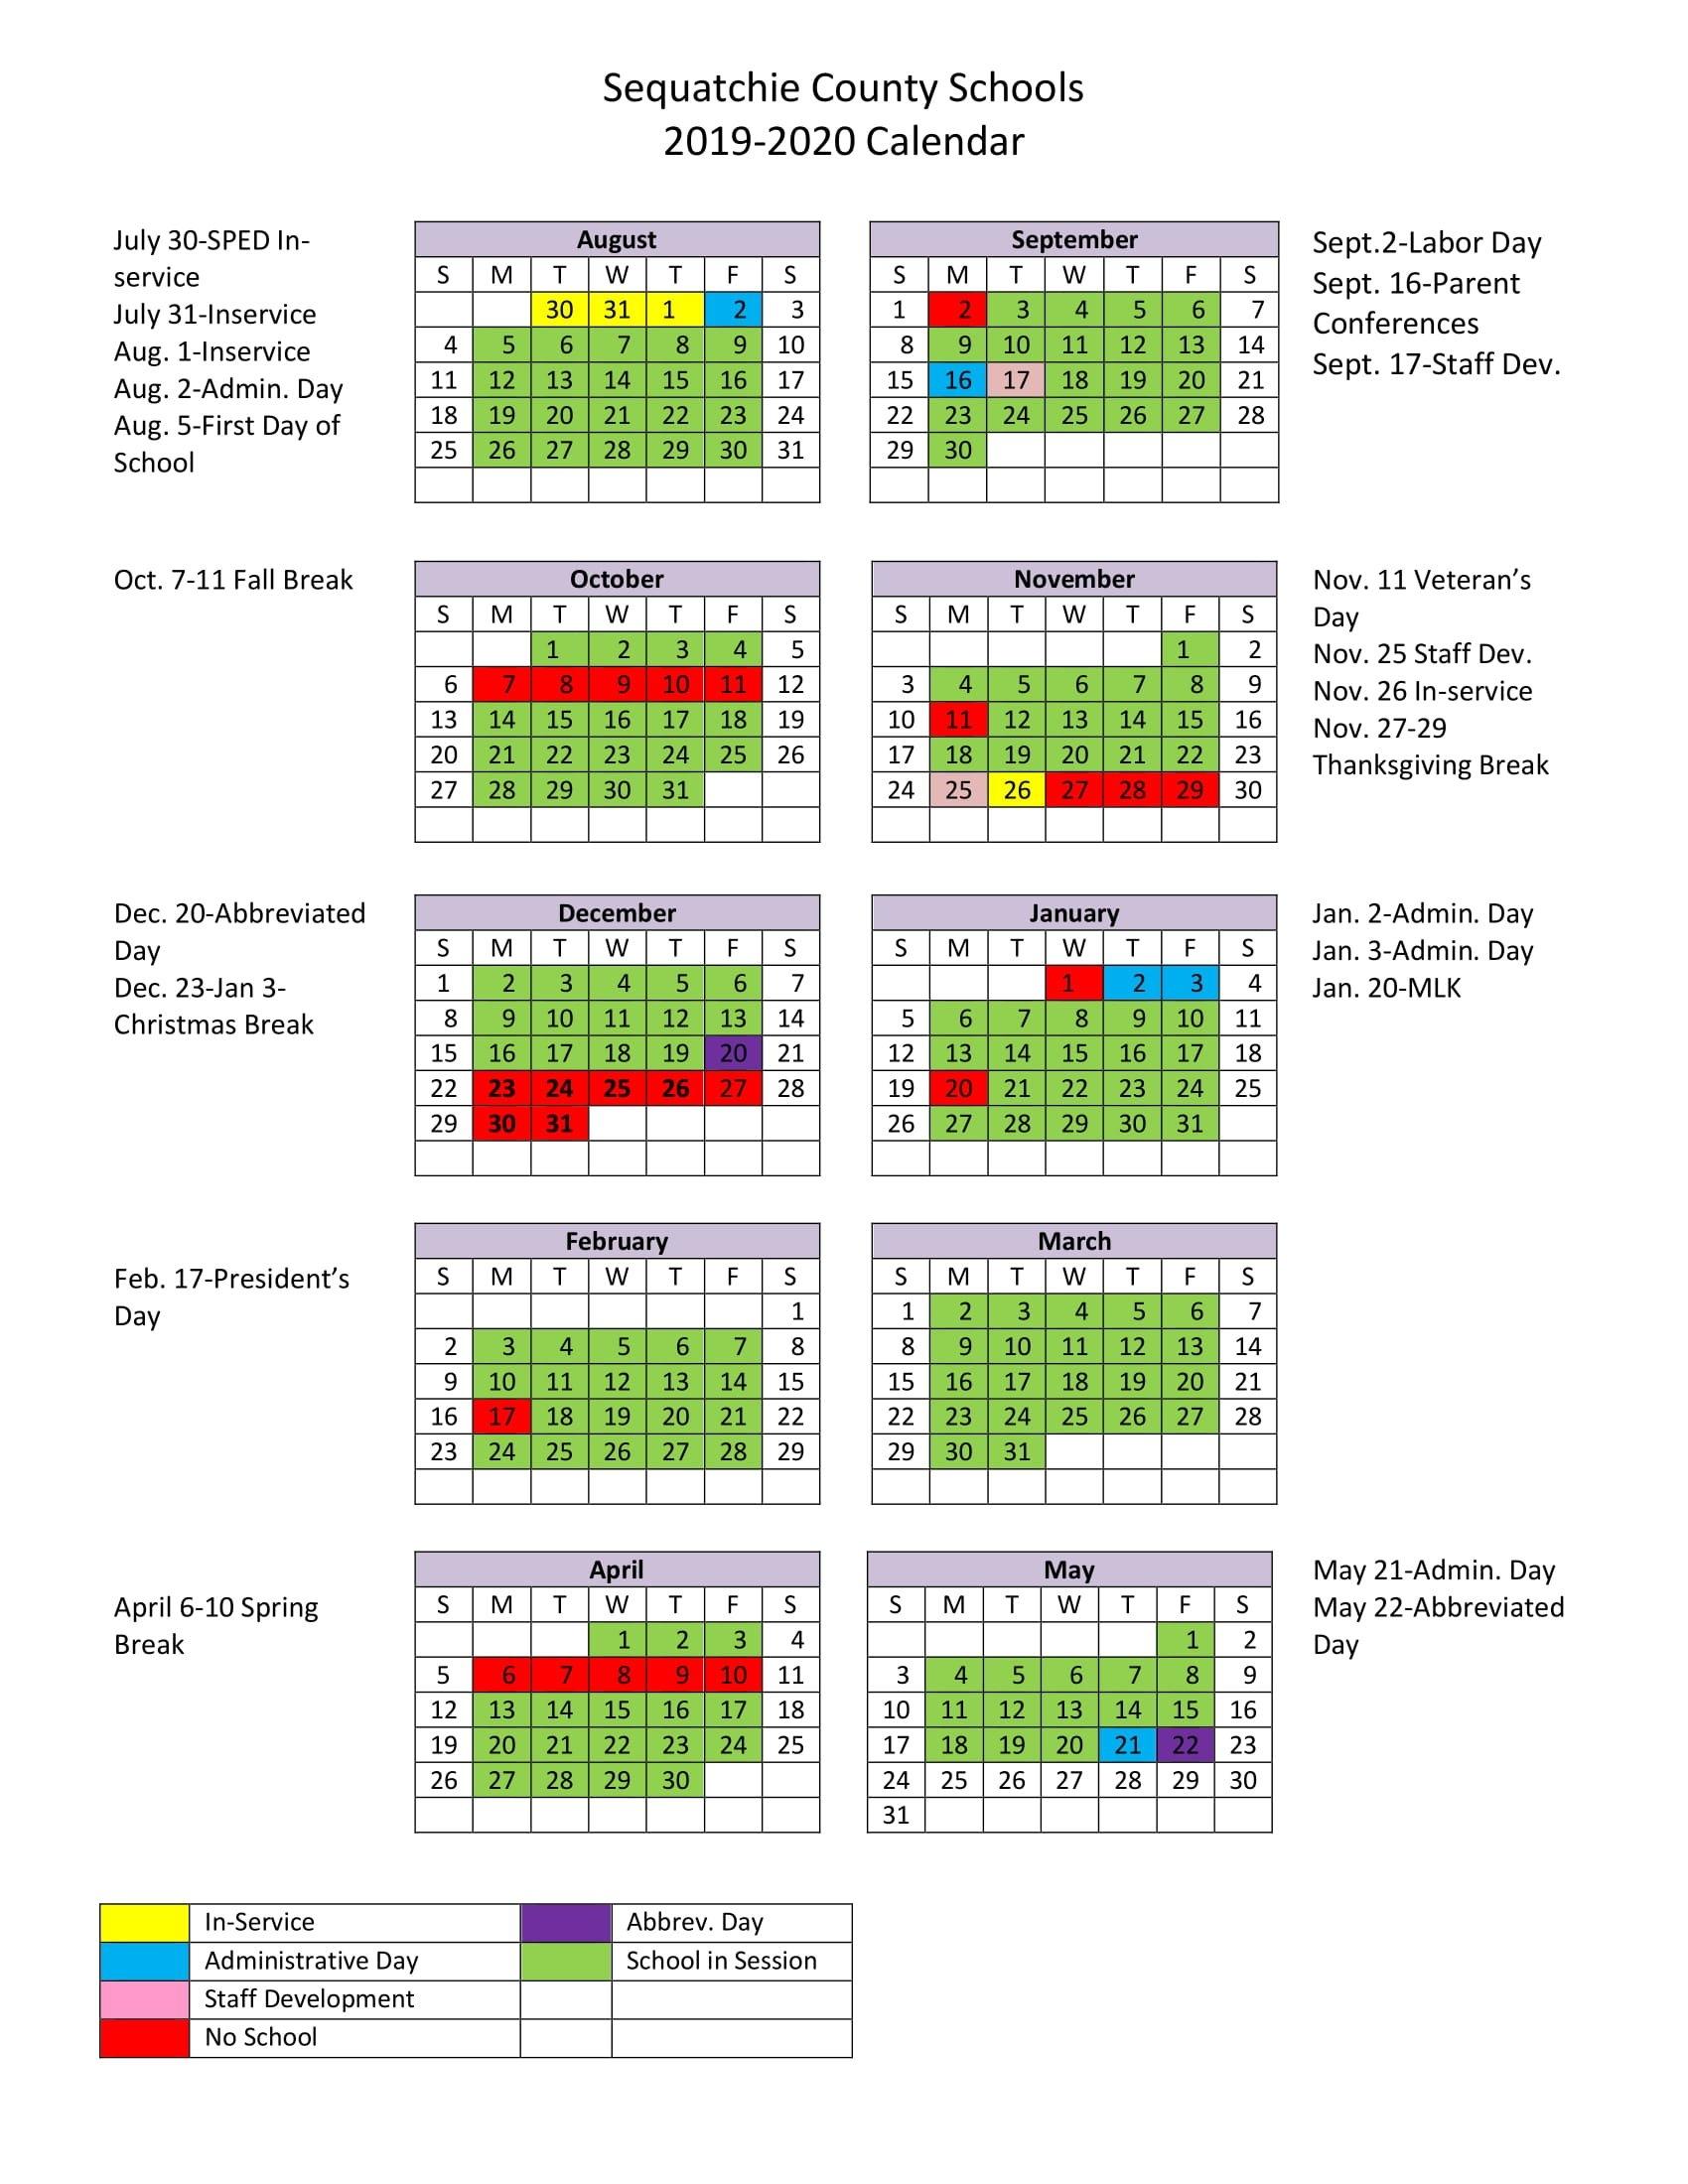 2018 19 School Calendar School Calendar 2019 20